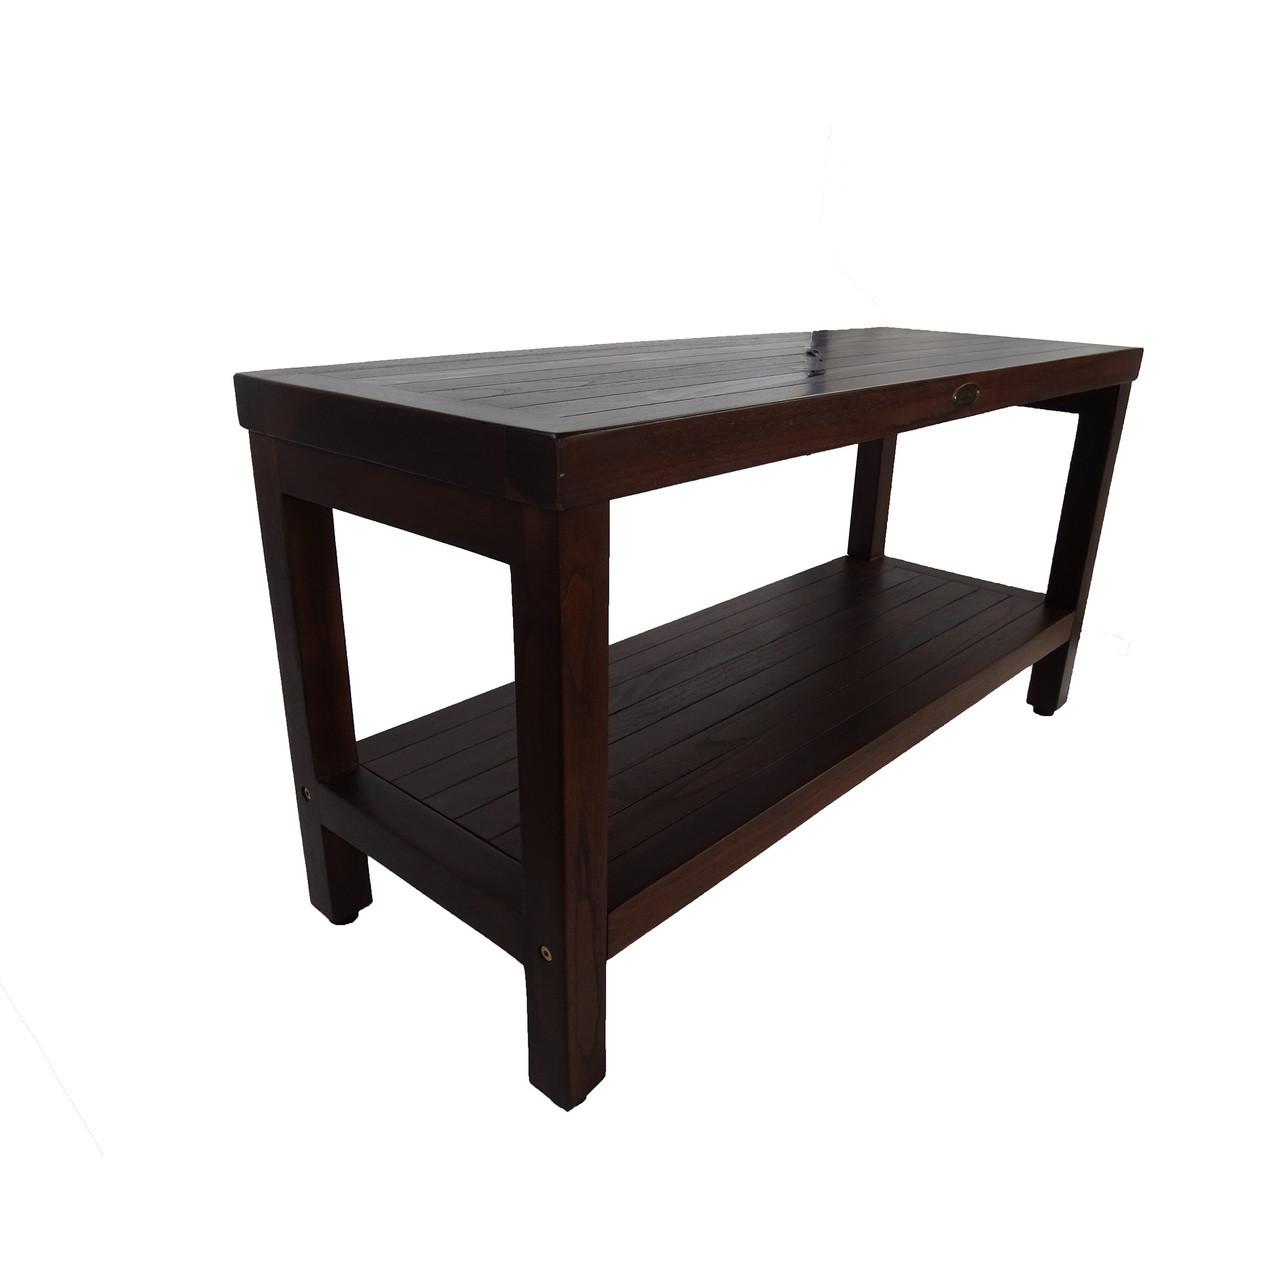 "DecoTeak Eleganto 36"" Teak Wood Shower Bench with Shelf in Woodland Brown Finish"